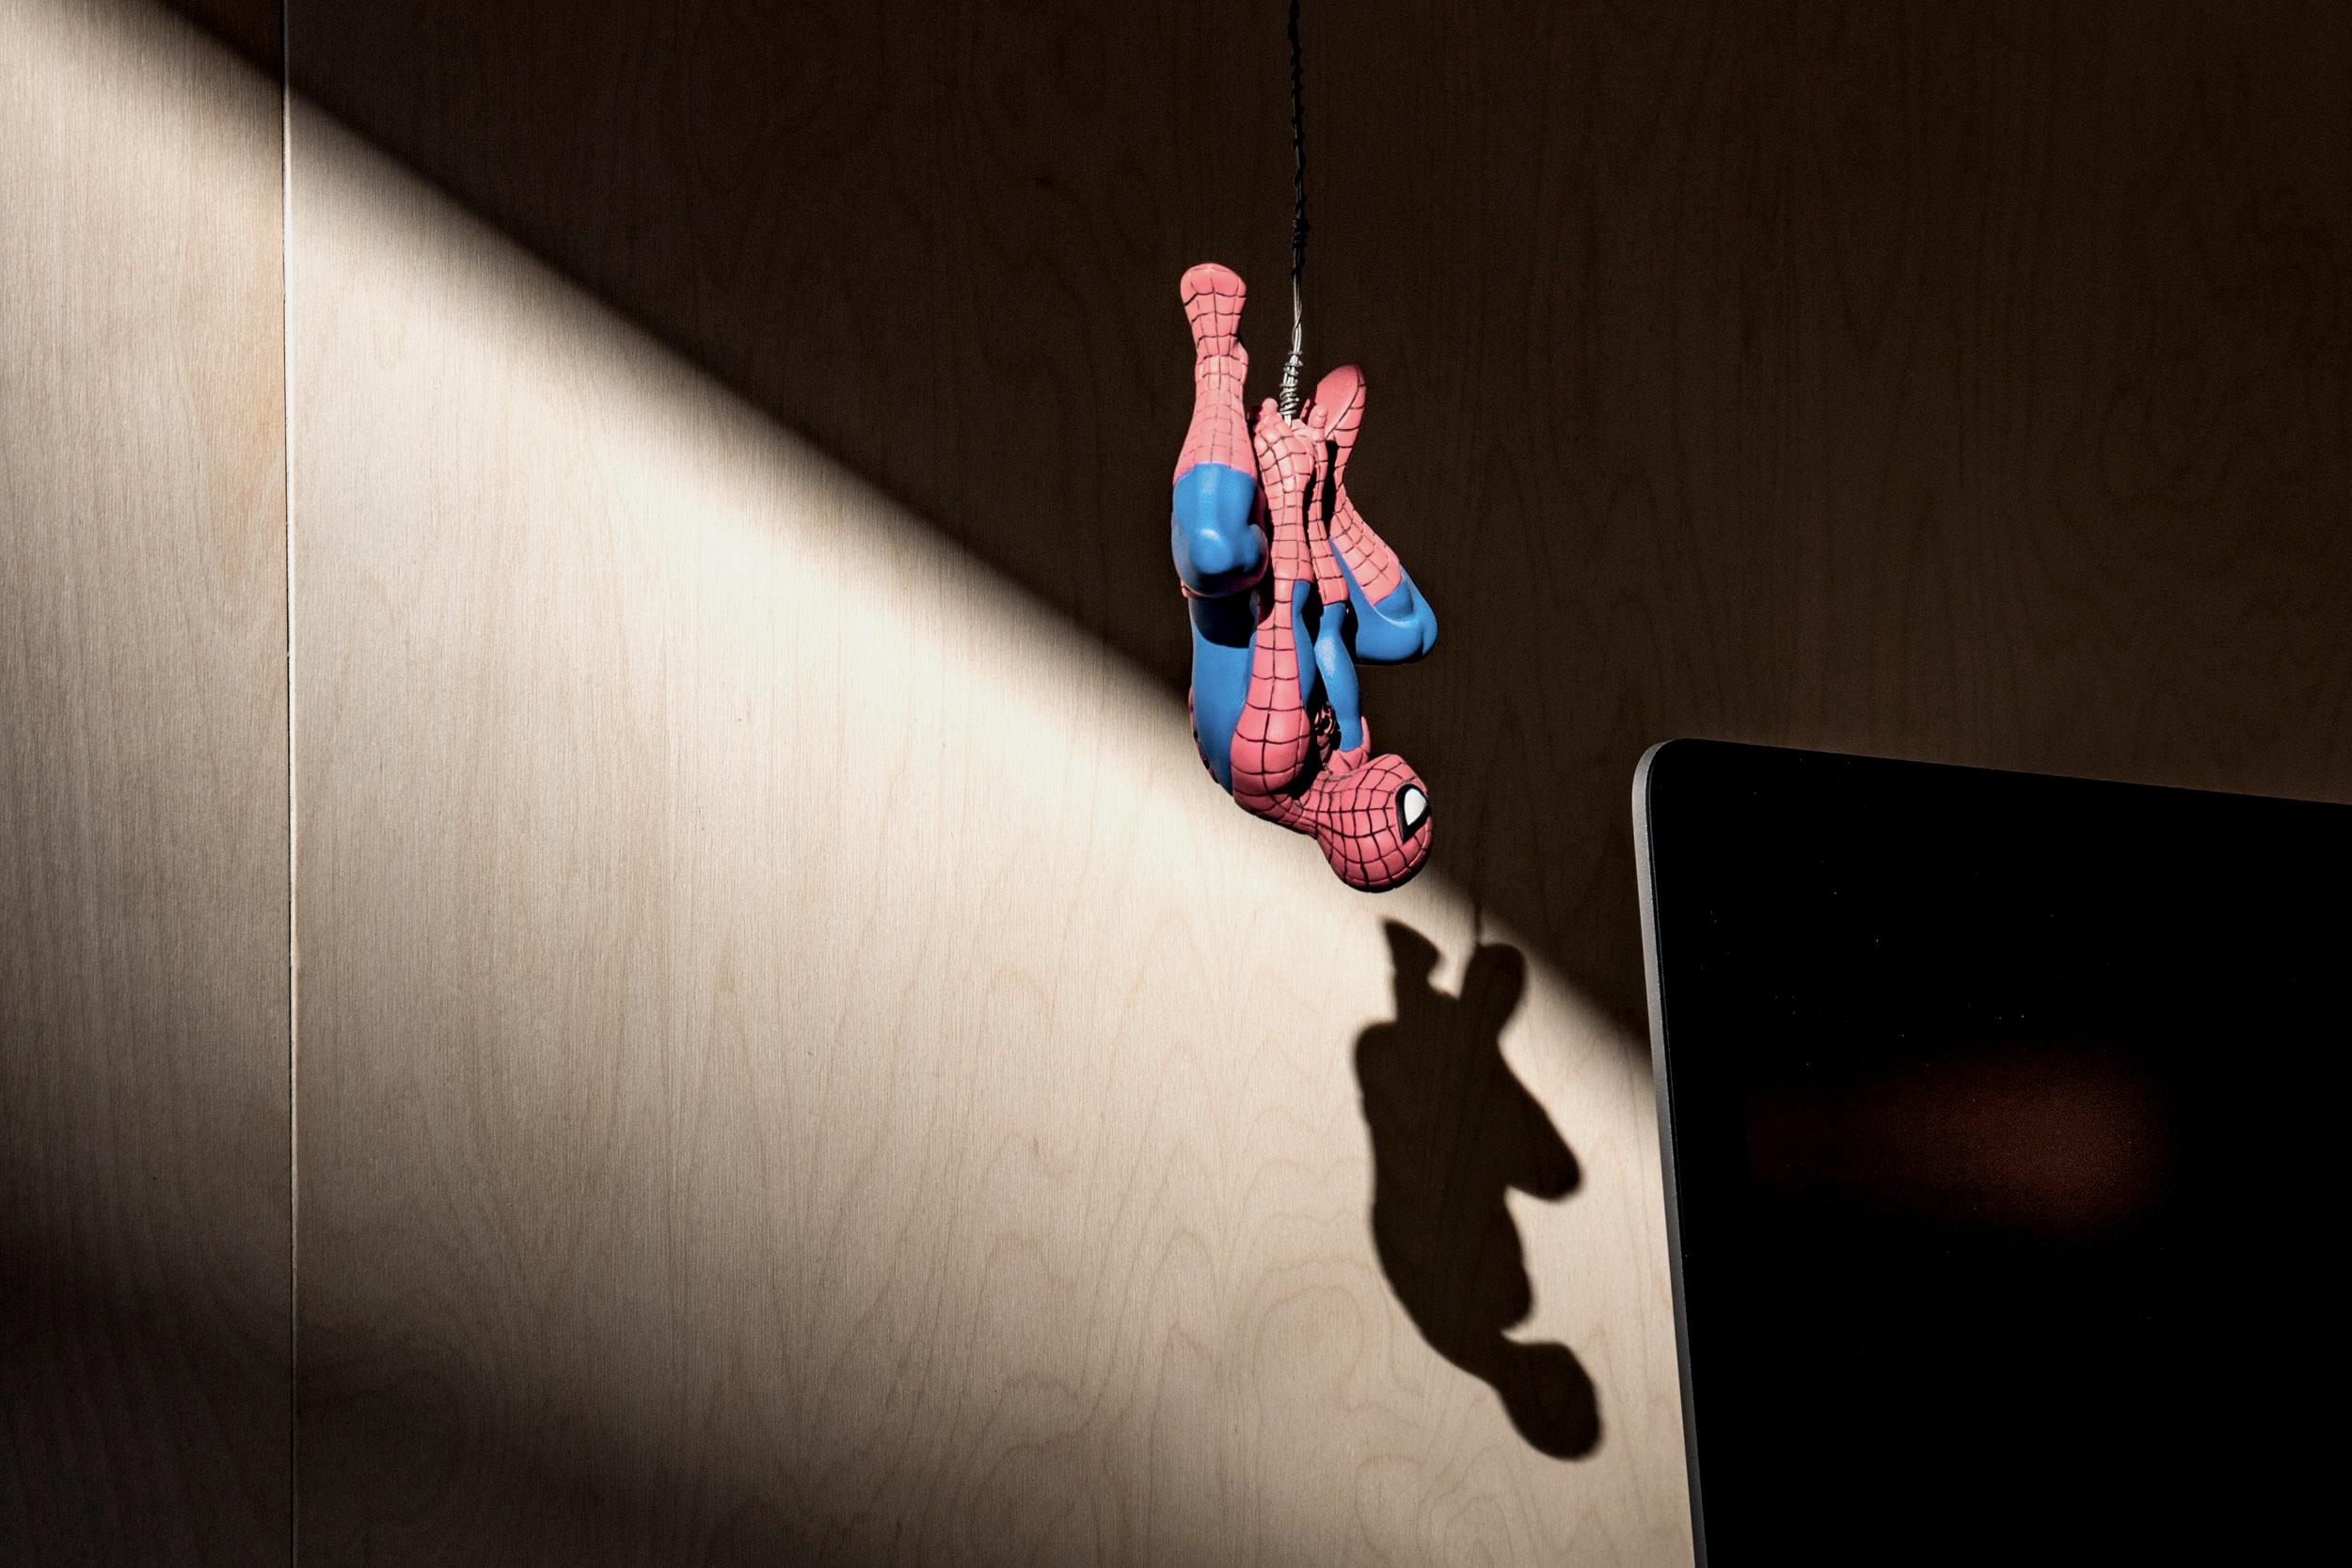 Wanna hang sometime? - Call me? Maybe?